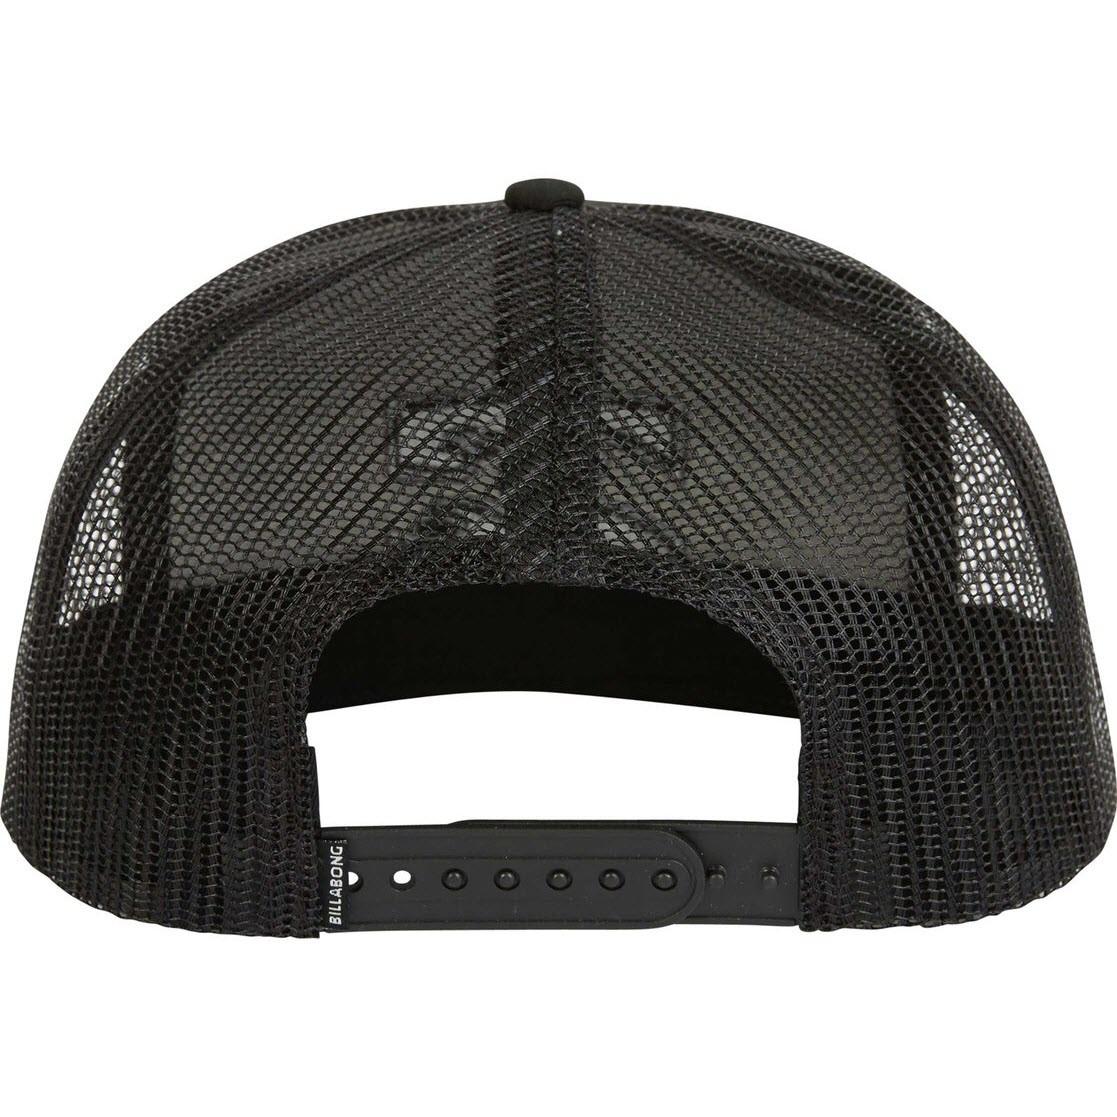 07daf014c5e Billabong All Day Trucker Hat (Men s) - Divers Direct